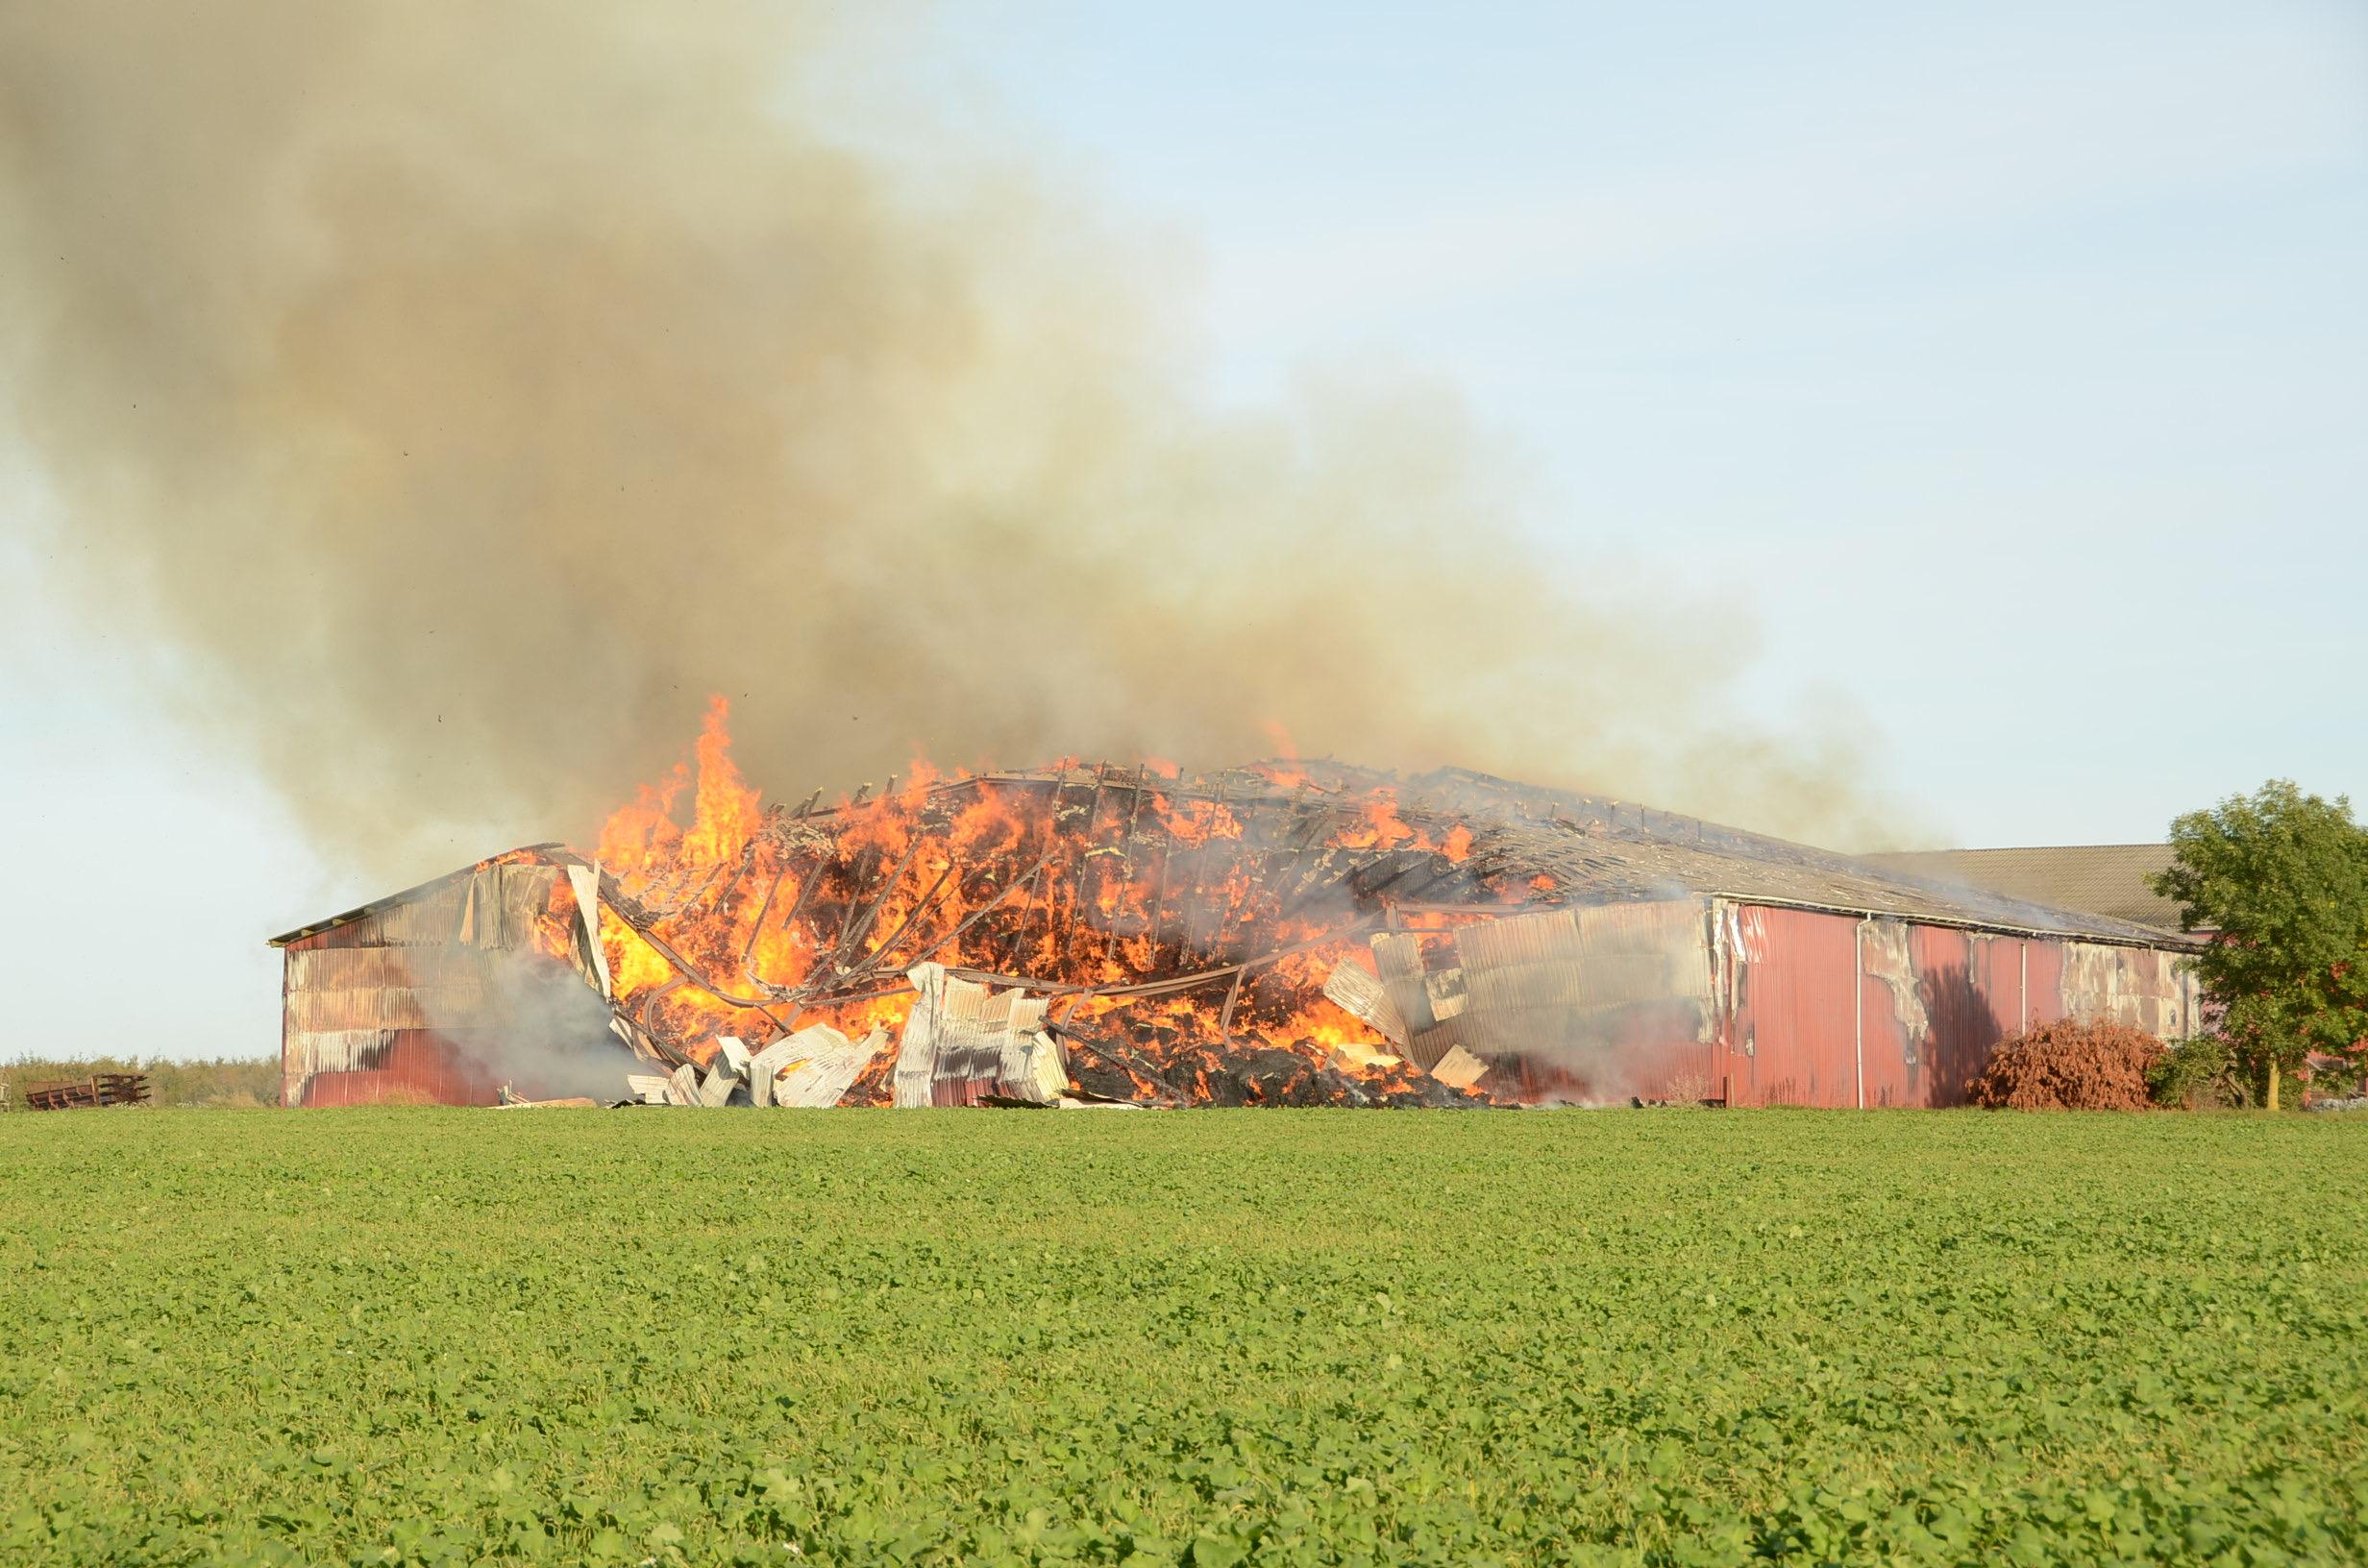 Heftig gårdbrand på Fyn - ilden står højt over bygningen